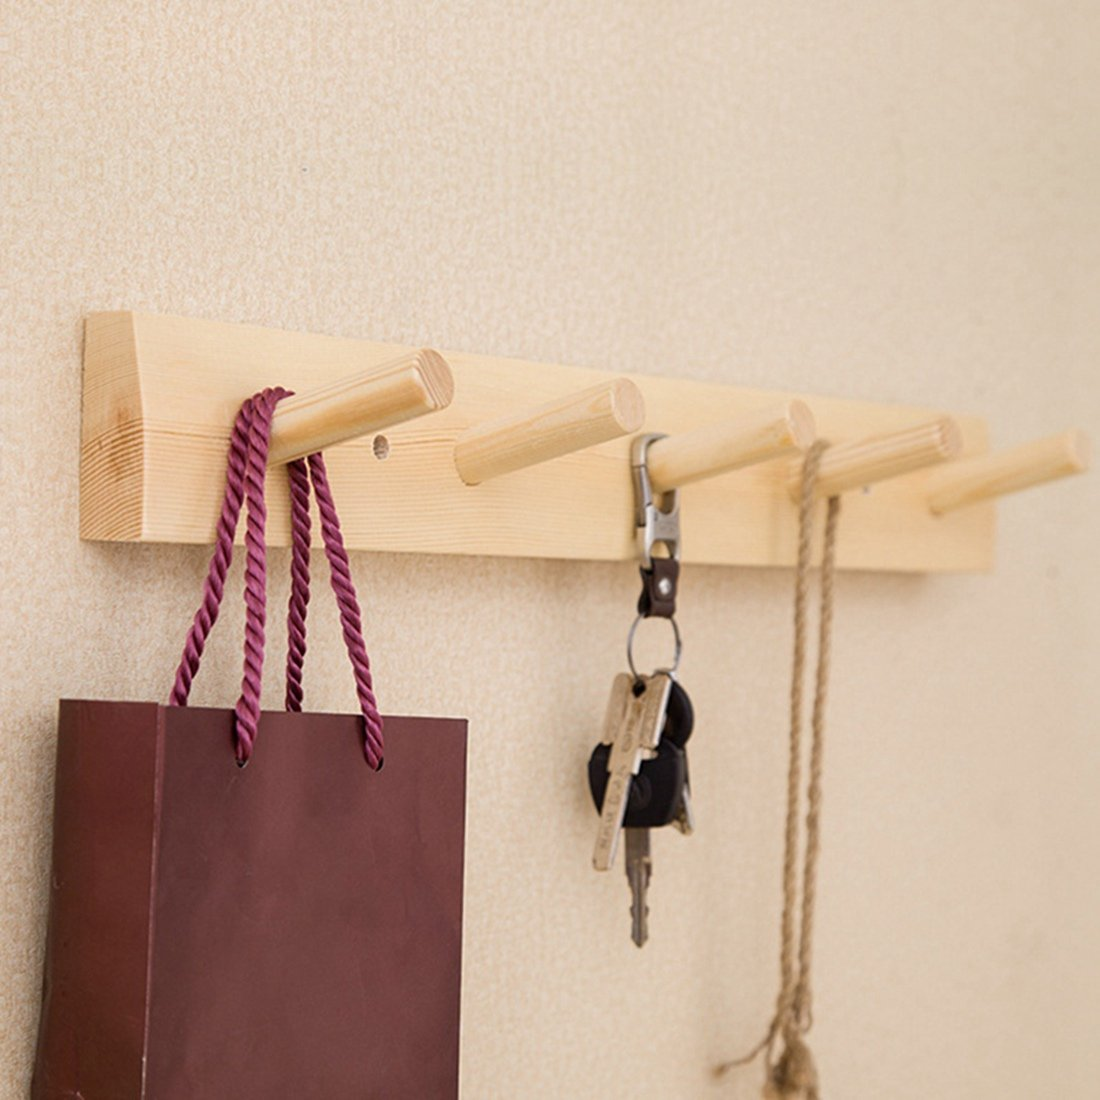 Jiyaru Wooden Coat Rail Rack Hook Wall Mounted Clothes Hanger Hat Holder Burlywood by Jiyaru (Image #5)